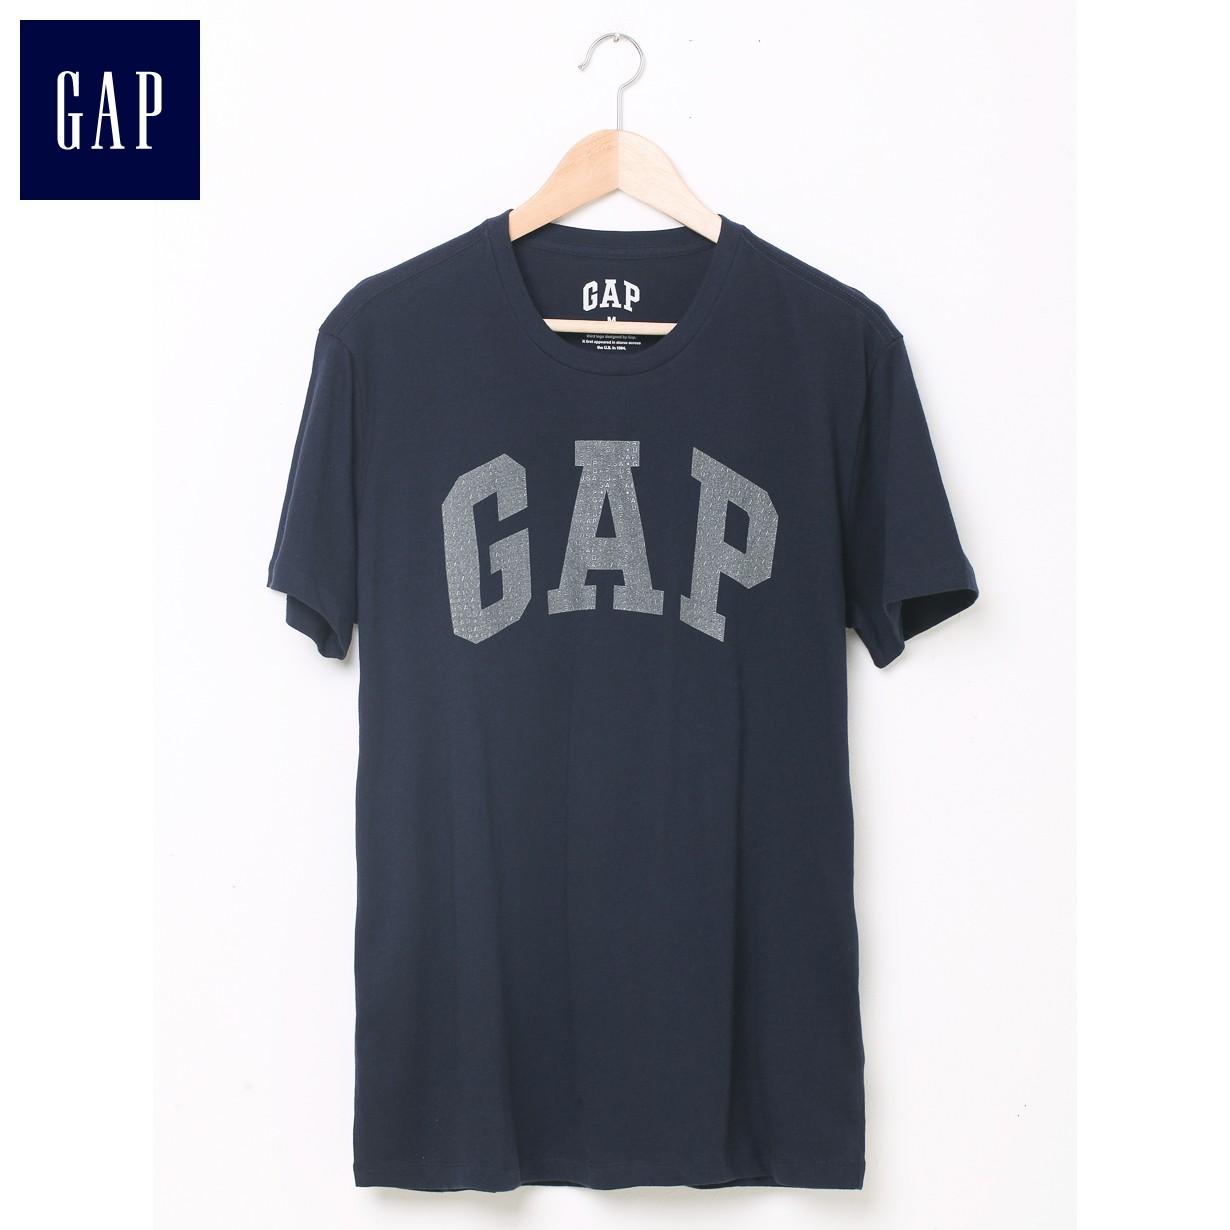 Футболка мужская GAP 000225238 5.15 225238 рубашка мужская gap 142643 349